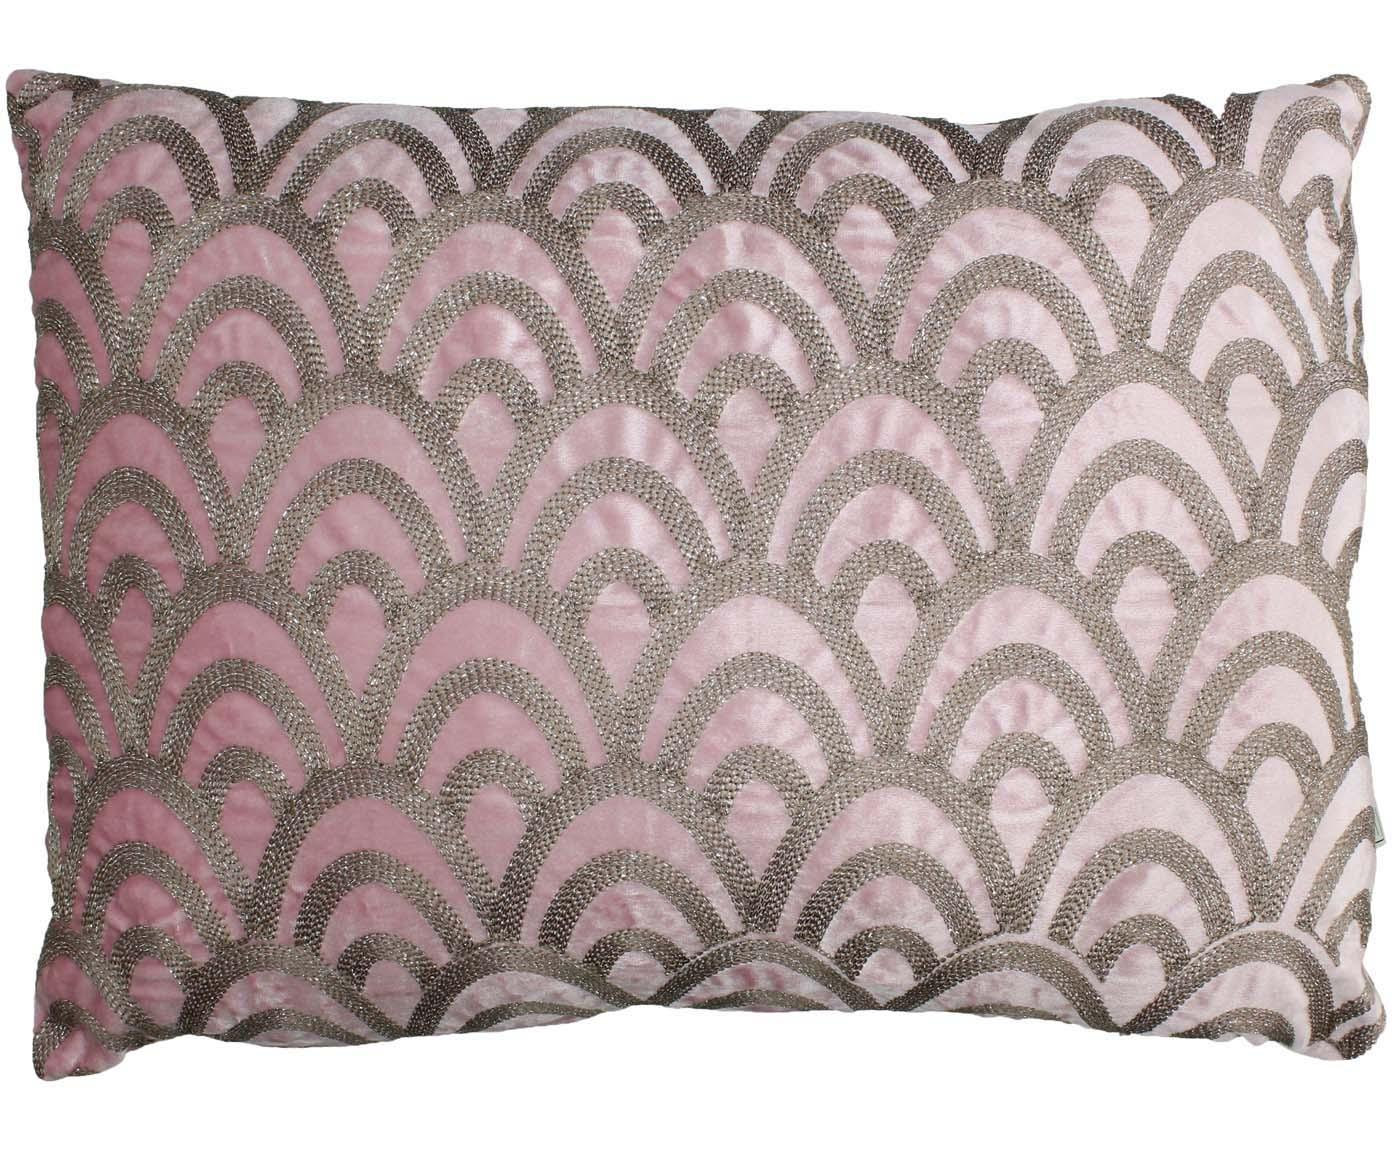 Cuscino con imbottitura in velluto Trole, Velluto, Rosa, argentato, Larg. 40 x Lung. 60 cm